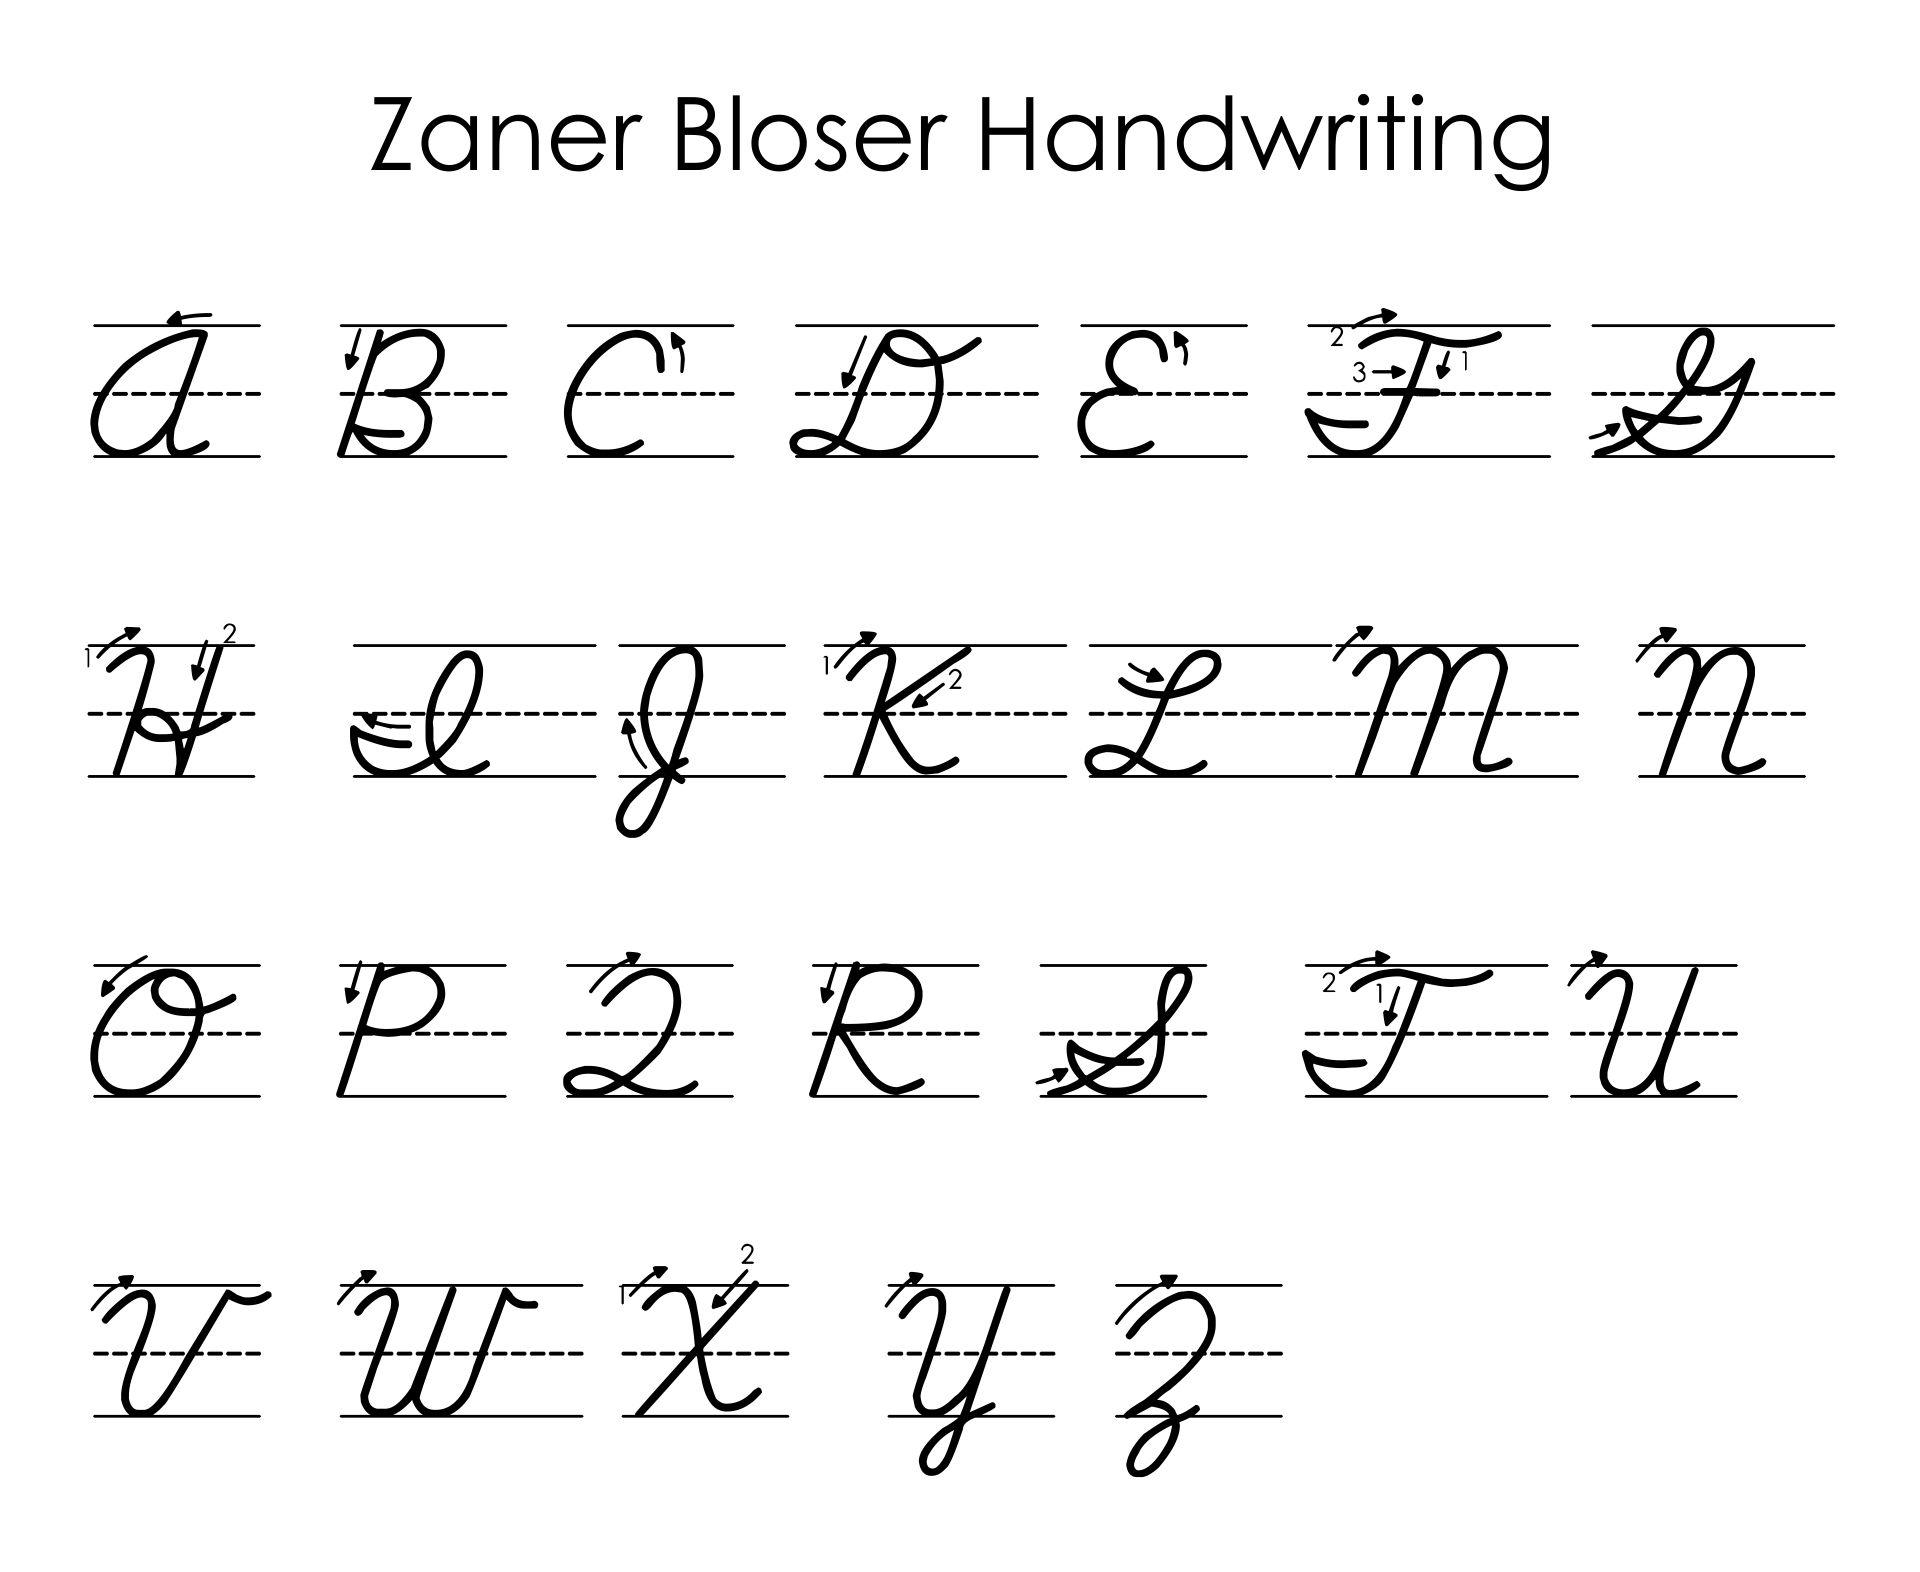 8 Images of Zaner-Bloser Manuscript Alphabet Printable